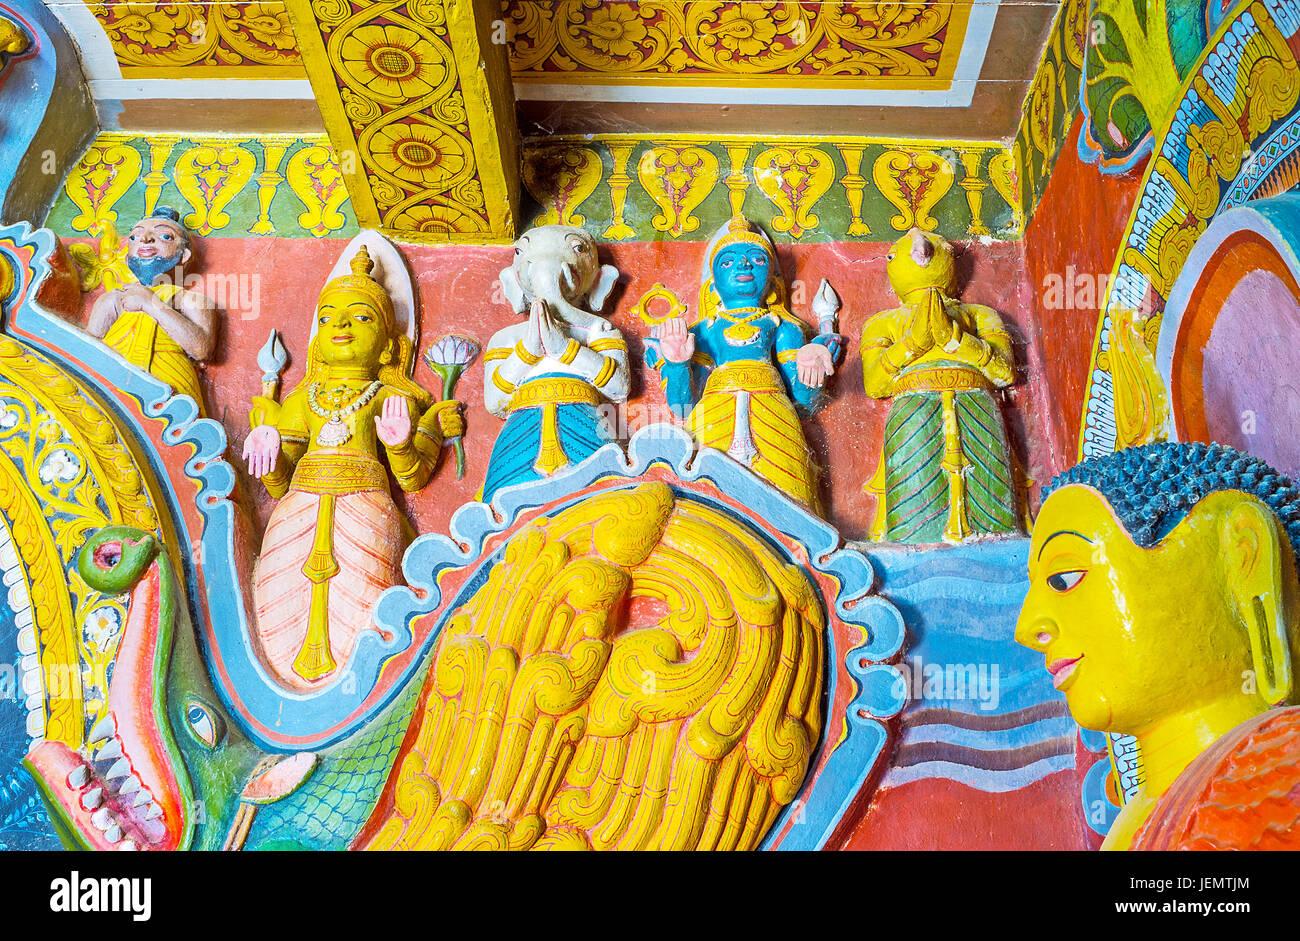 UDUNUWARA, SRI LANKA - NOVEMBER 29, 2016: The Hindu deities are the parts of Dragon's Arch in Sanctum of Garagha - Stock Image